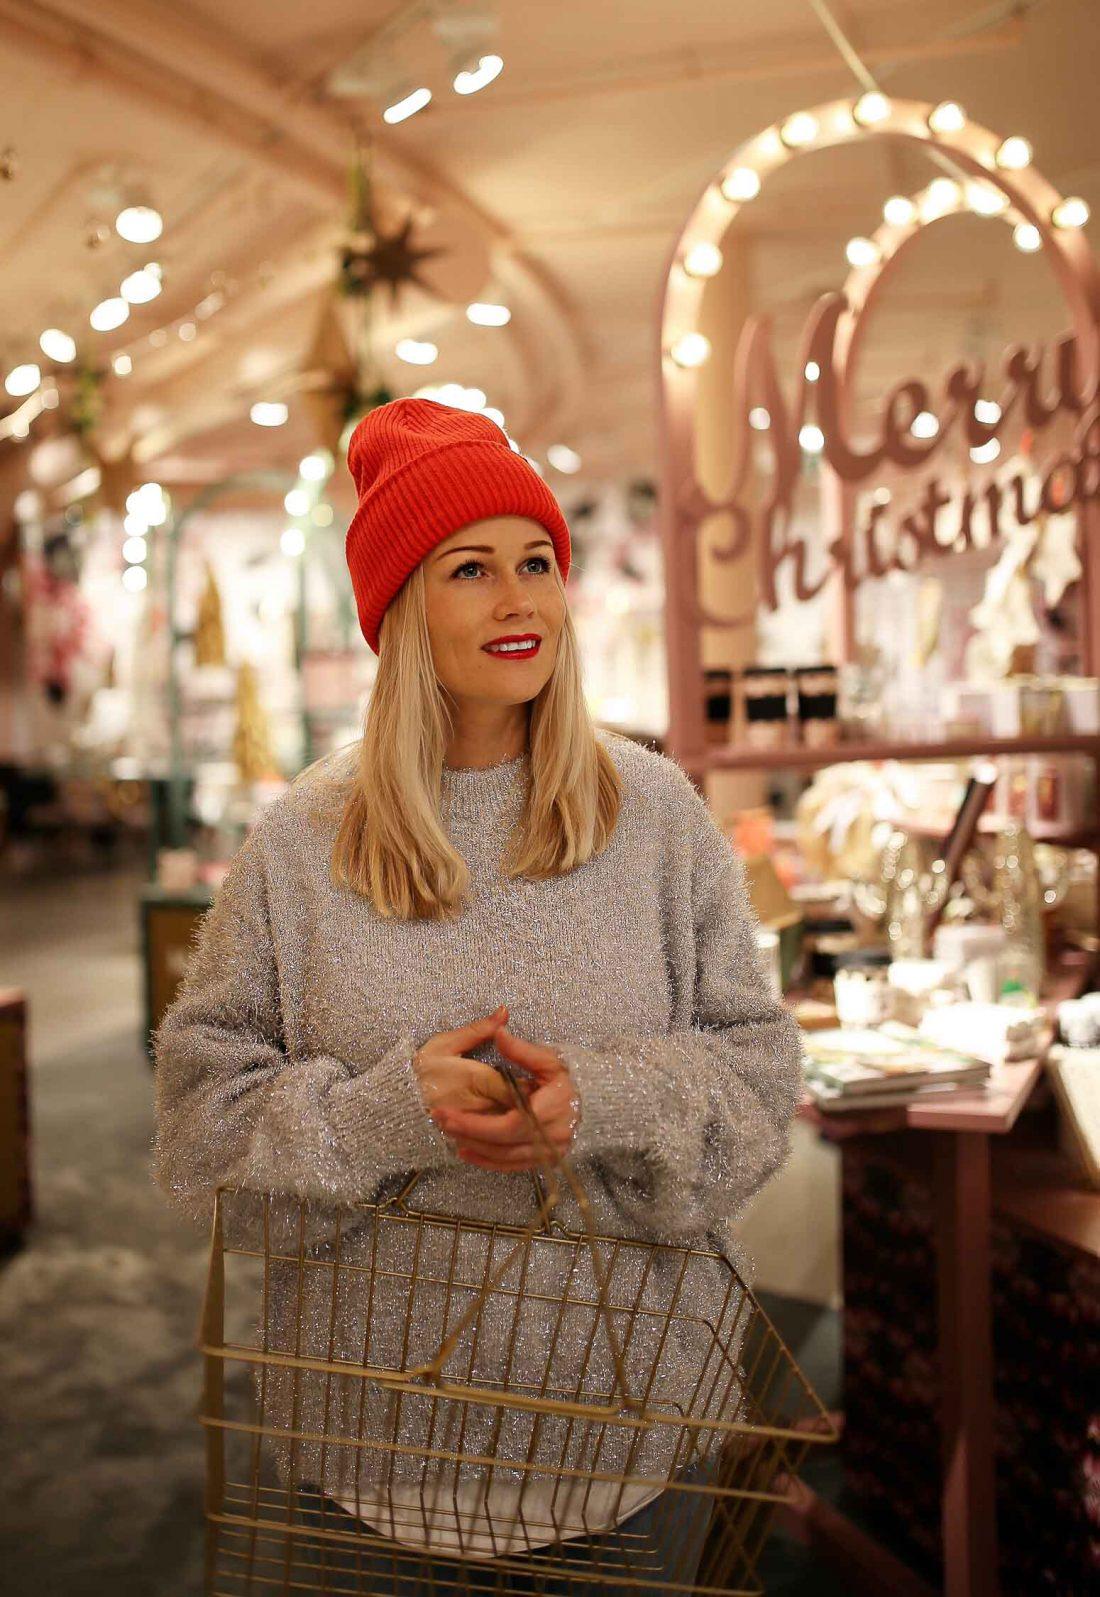 stylingliebe-lifestyleblogger-fashionblog-muenchen-styleblog-munich-blogger-deutschland-fashionblogger-lifestyleblog-modeblog-der-weihnachtsmarkt-im-konen-modehaus-geschenkideen-8-1100x1597